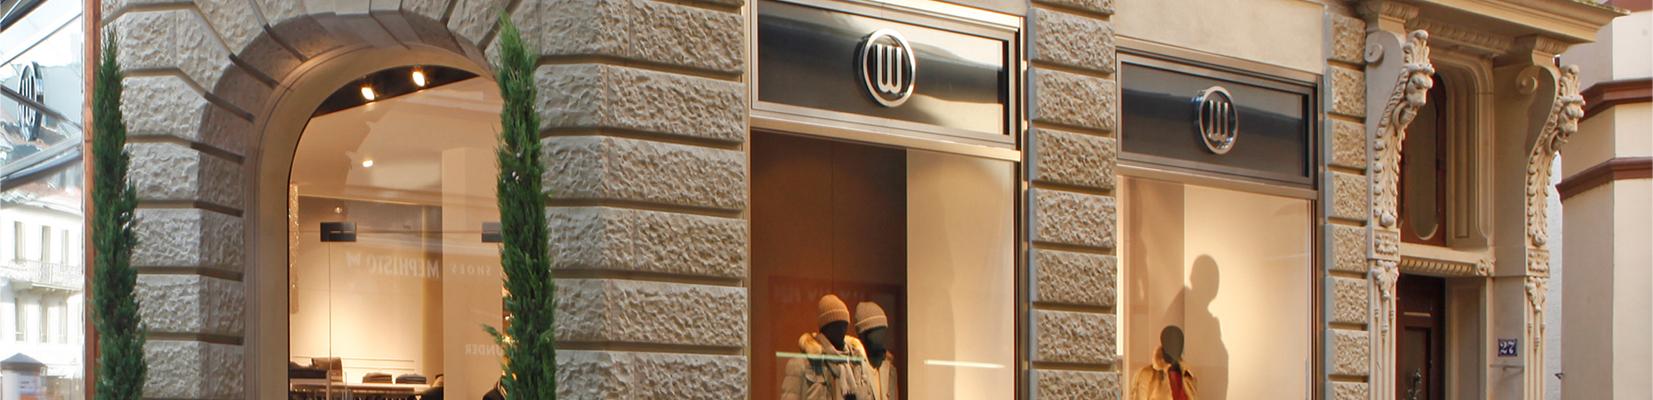 MODEWAGENER - Luxury Store